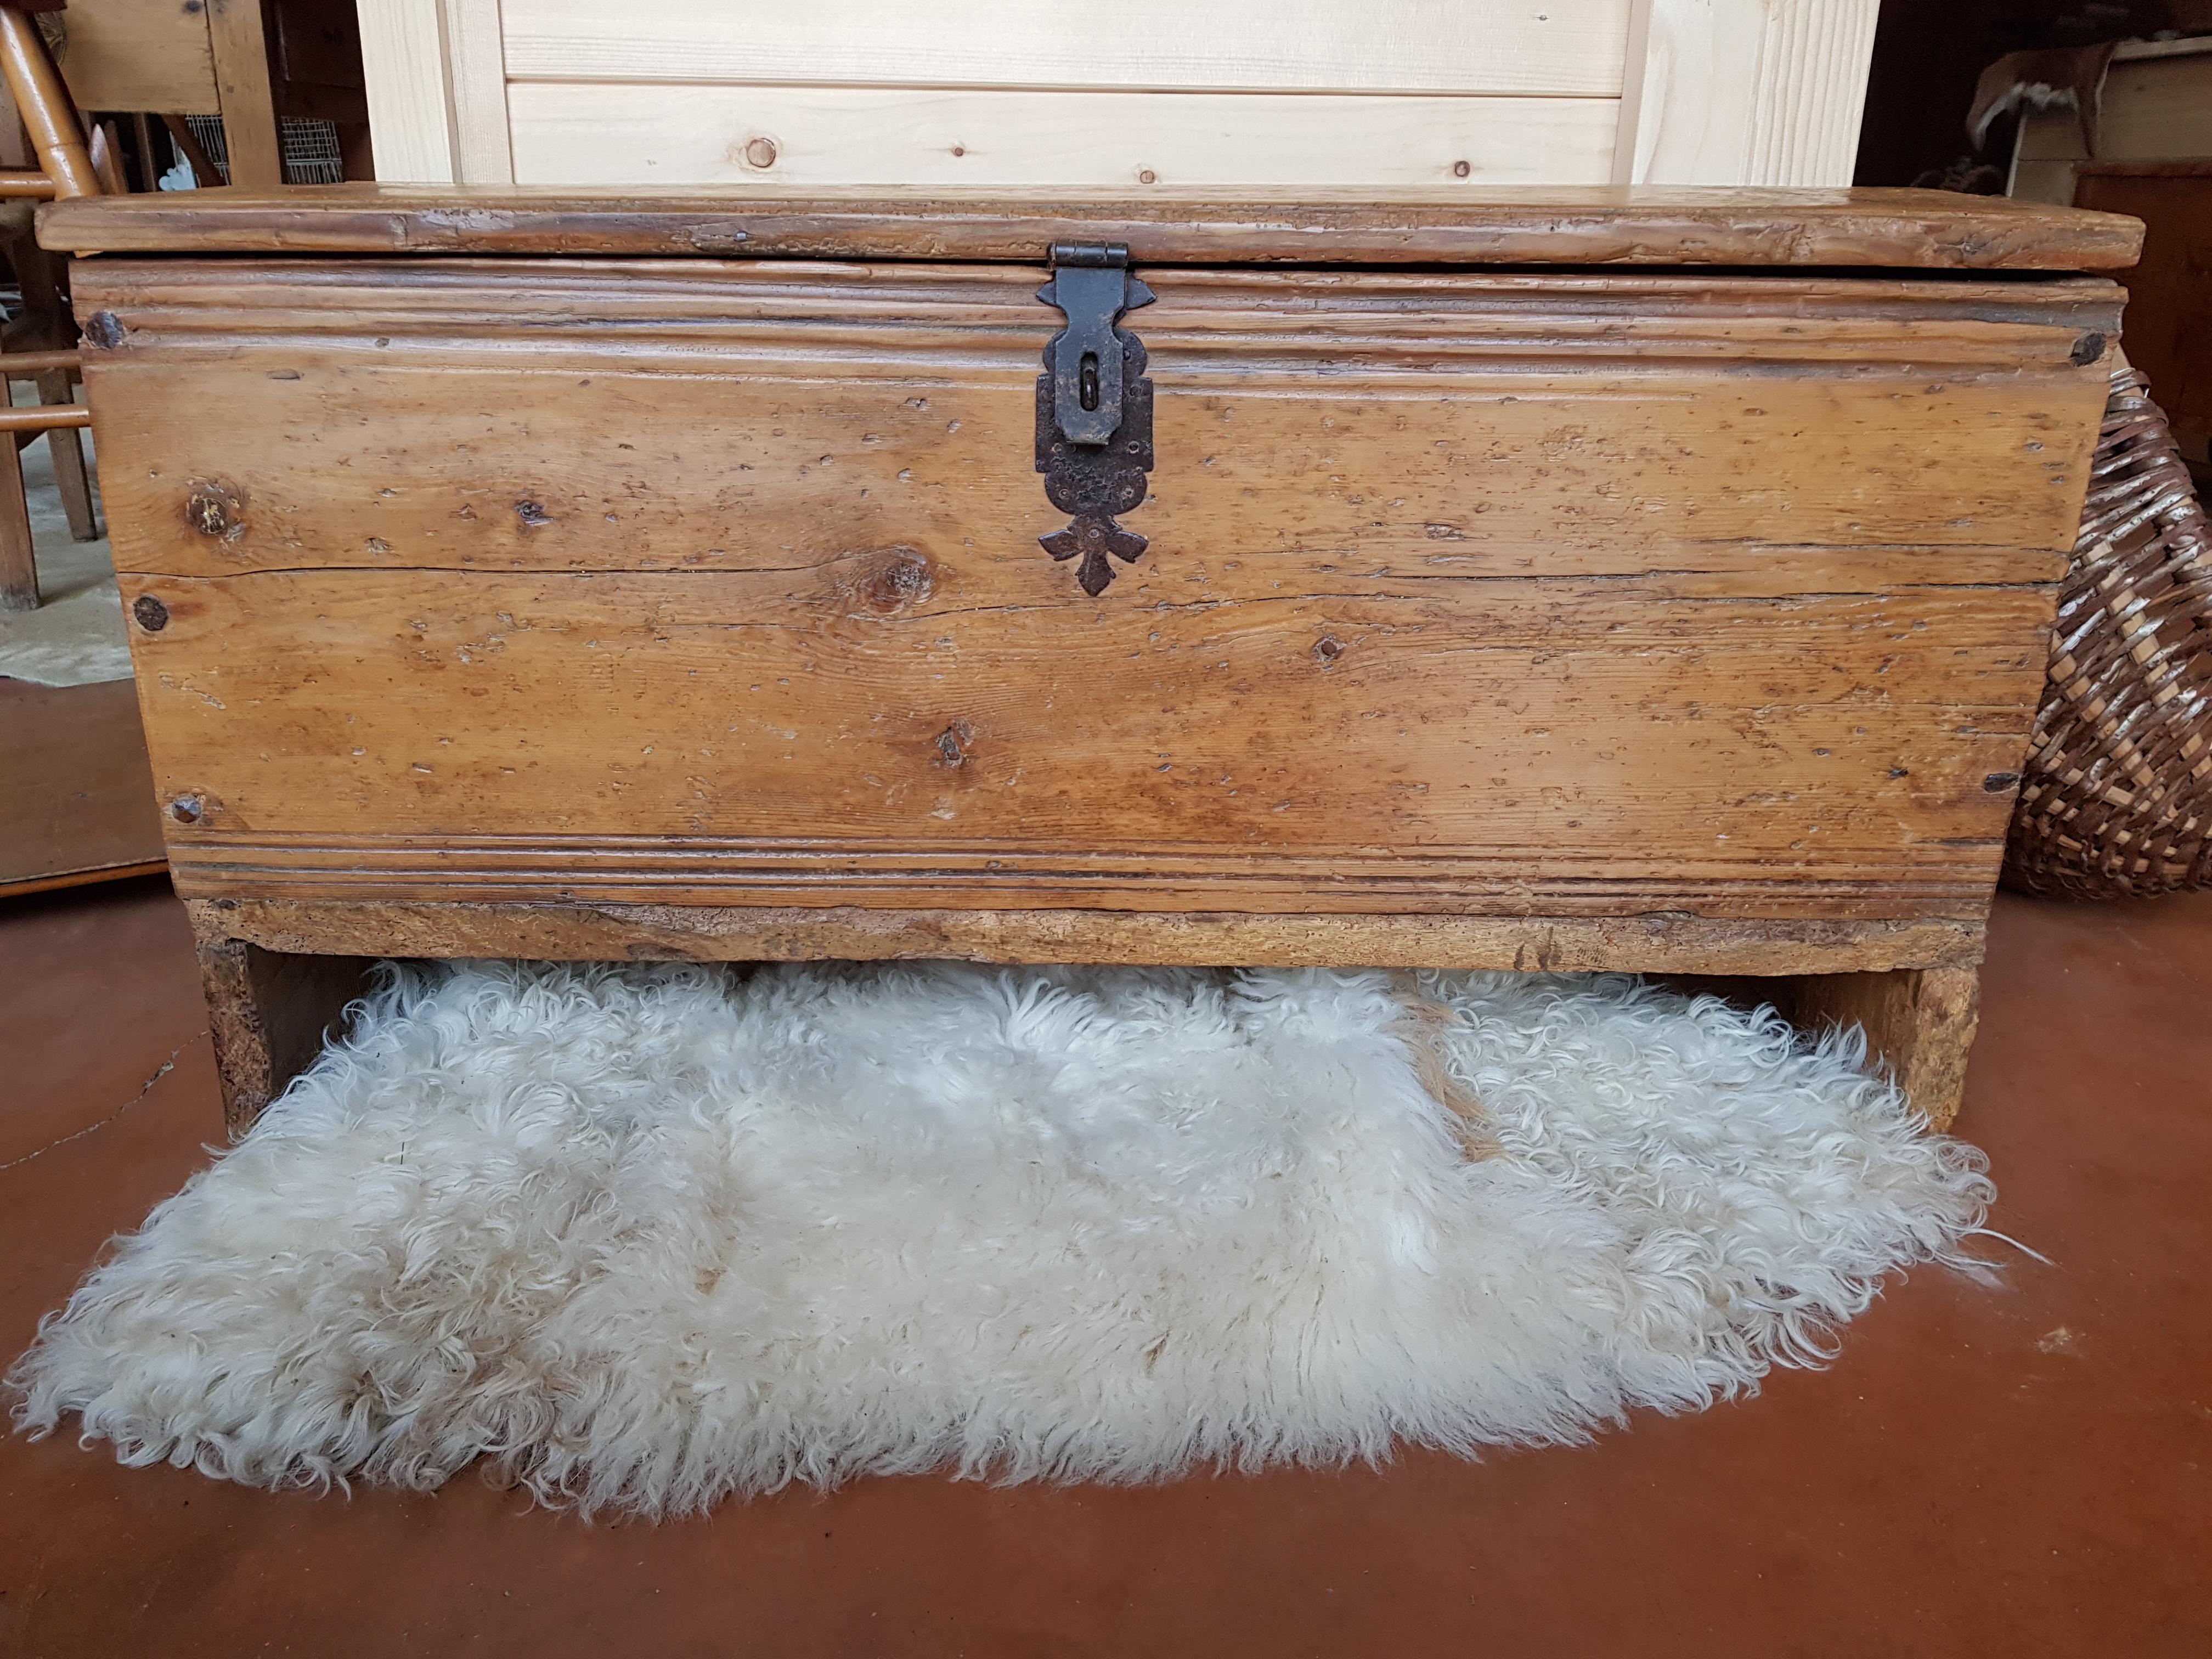 Coffre Ancien Savoyard Crest Voland Antiquite 17eme Siecle